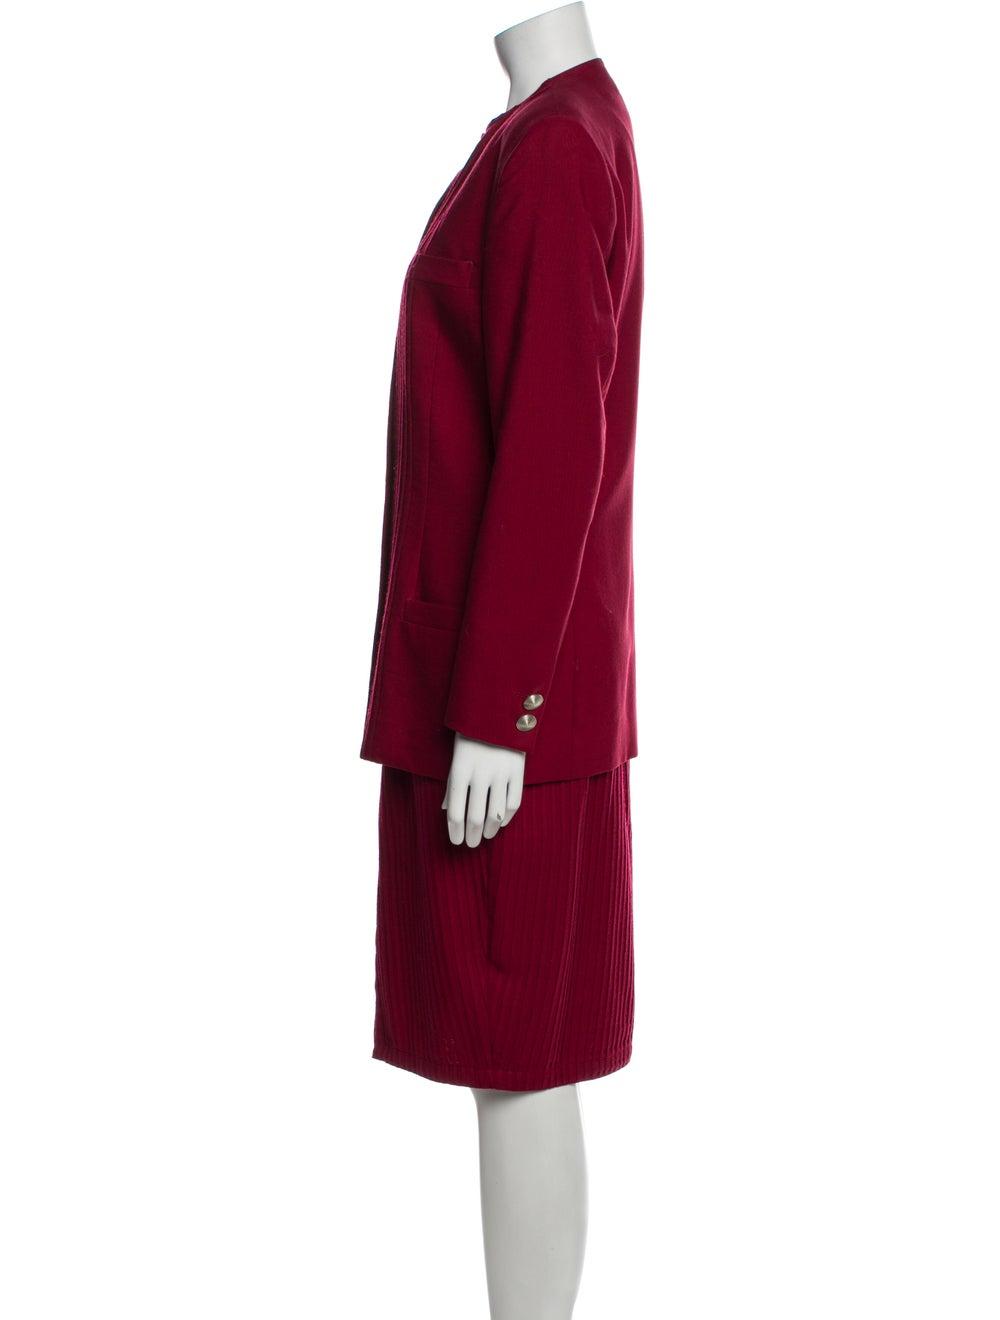 Gianni Versace Vintage 1990 Skirt Suit Wool - image 2